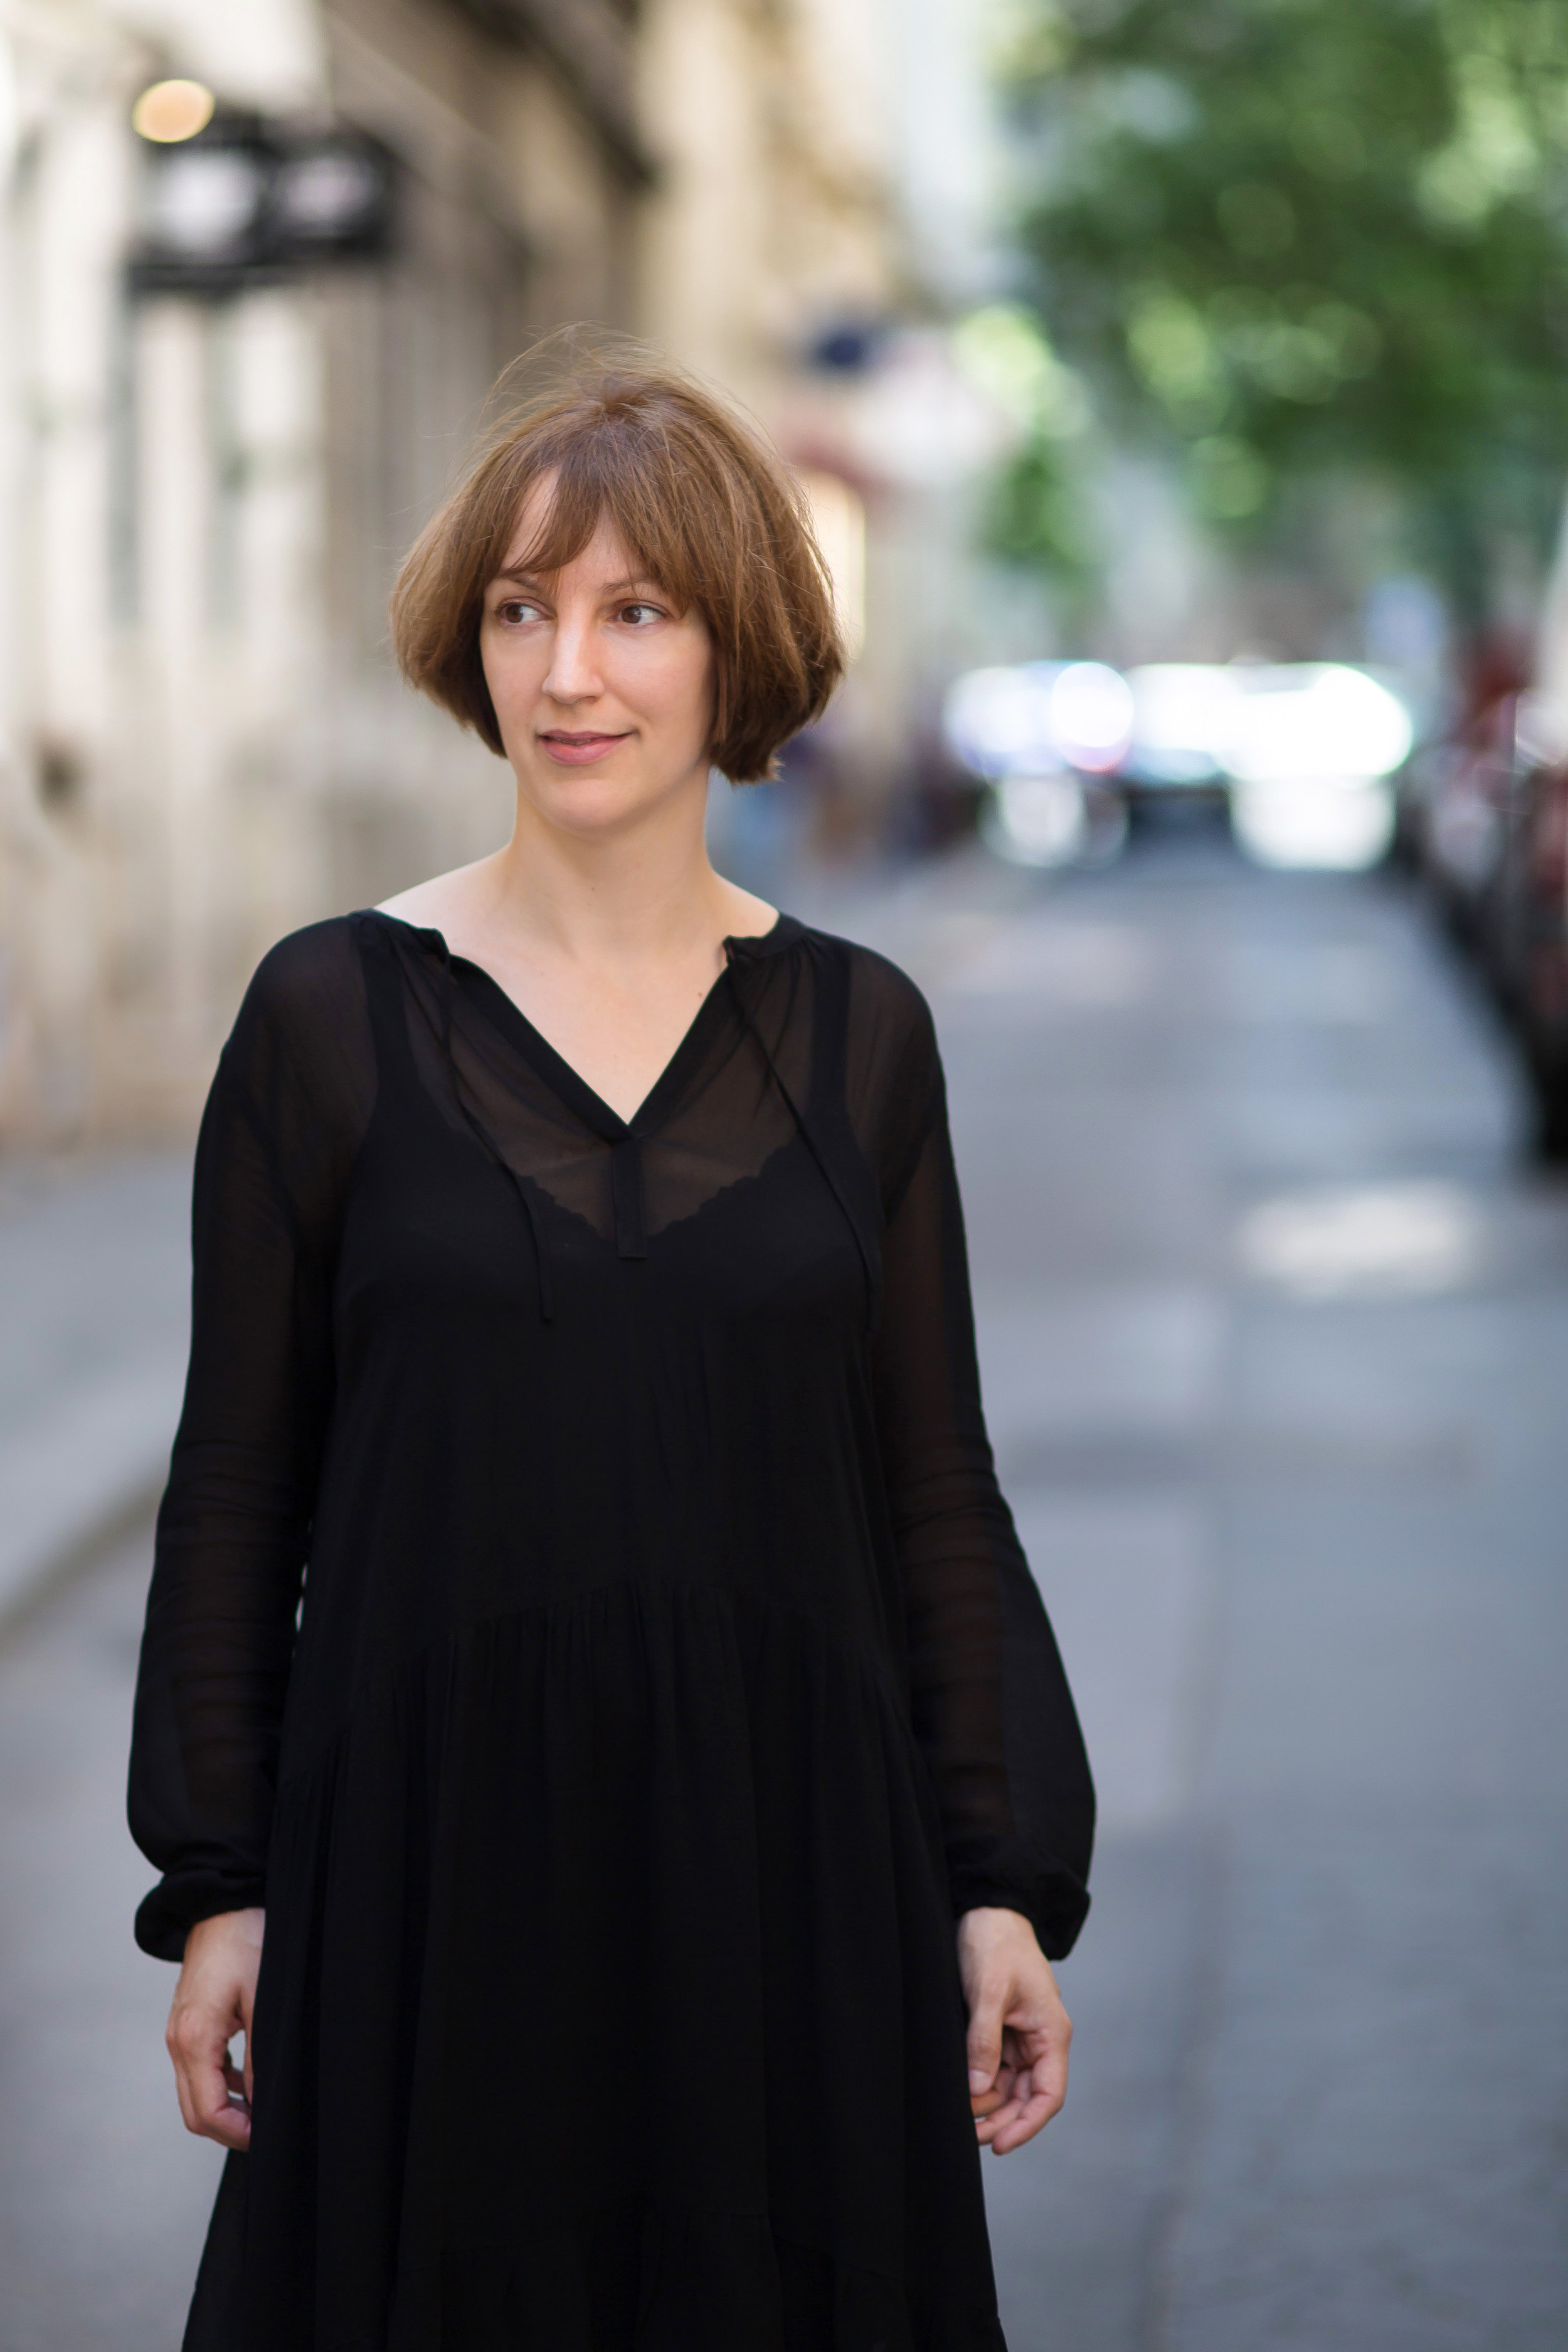 Hello there - Nice to meet you! I am Ilse Josepha Lazaroms.